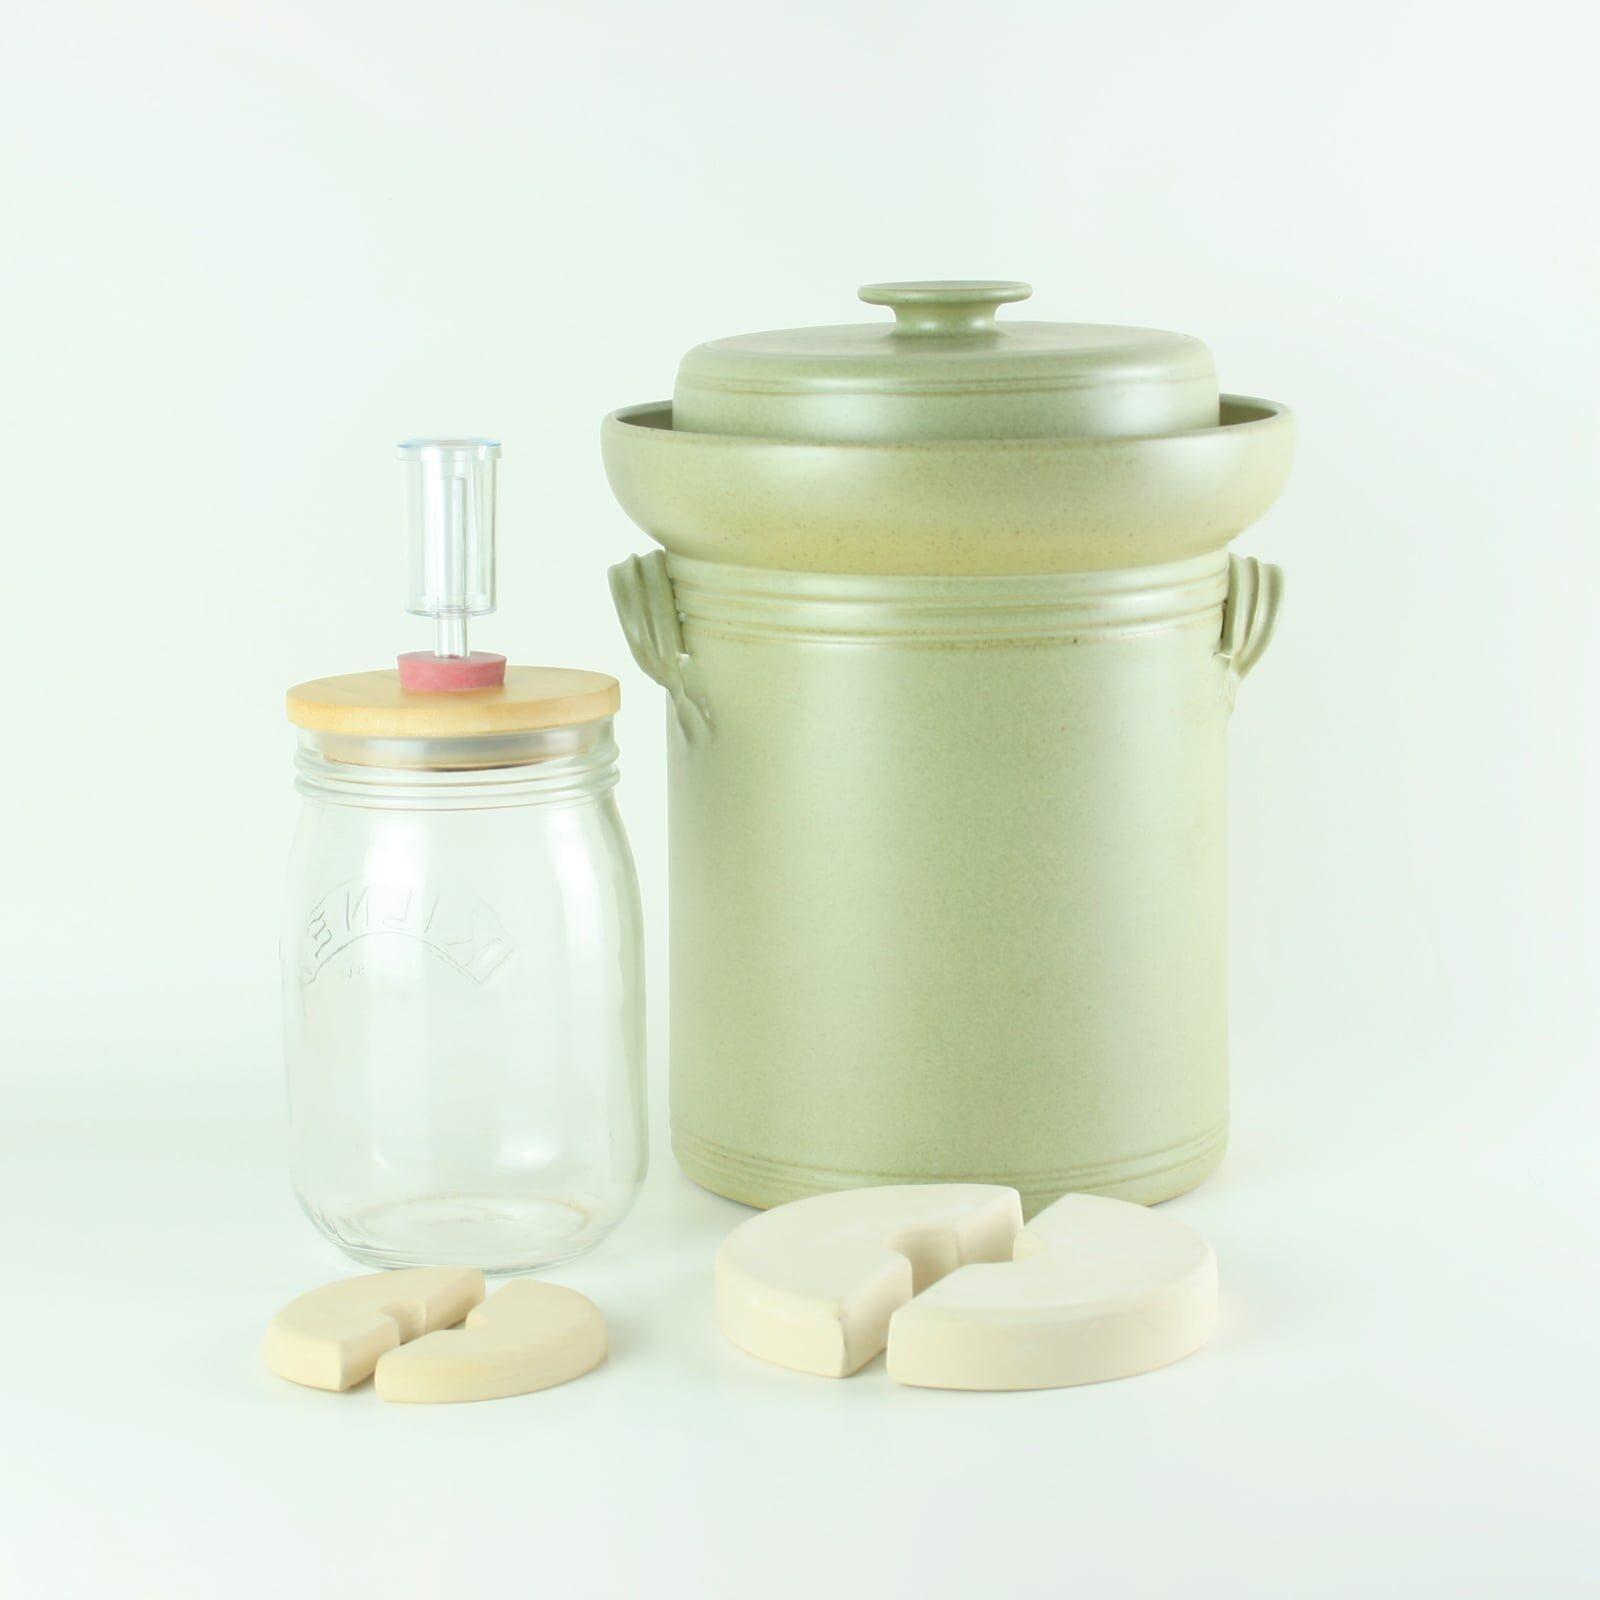 Making Kimchi and Sauerkraut